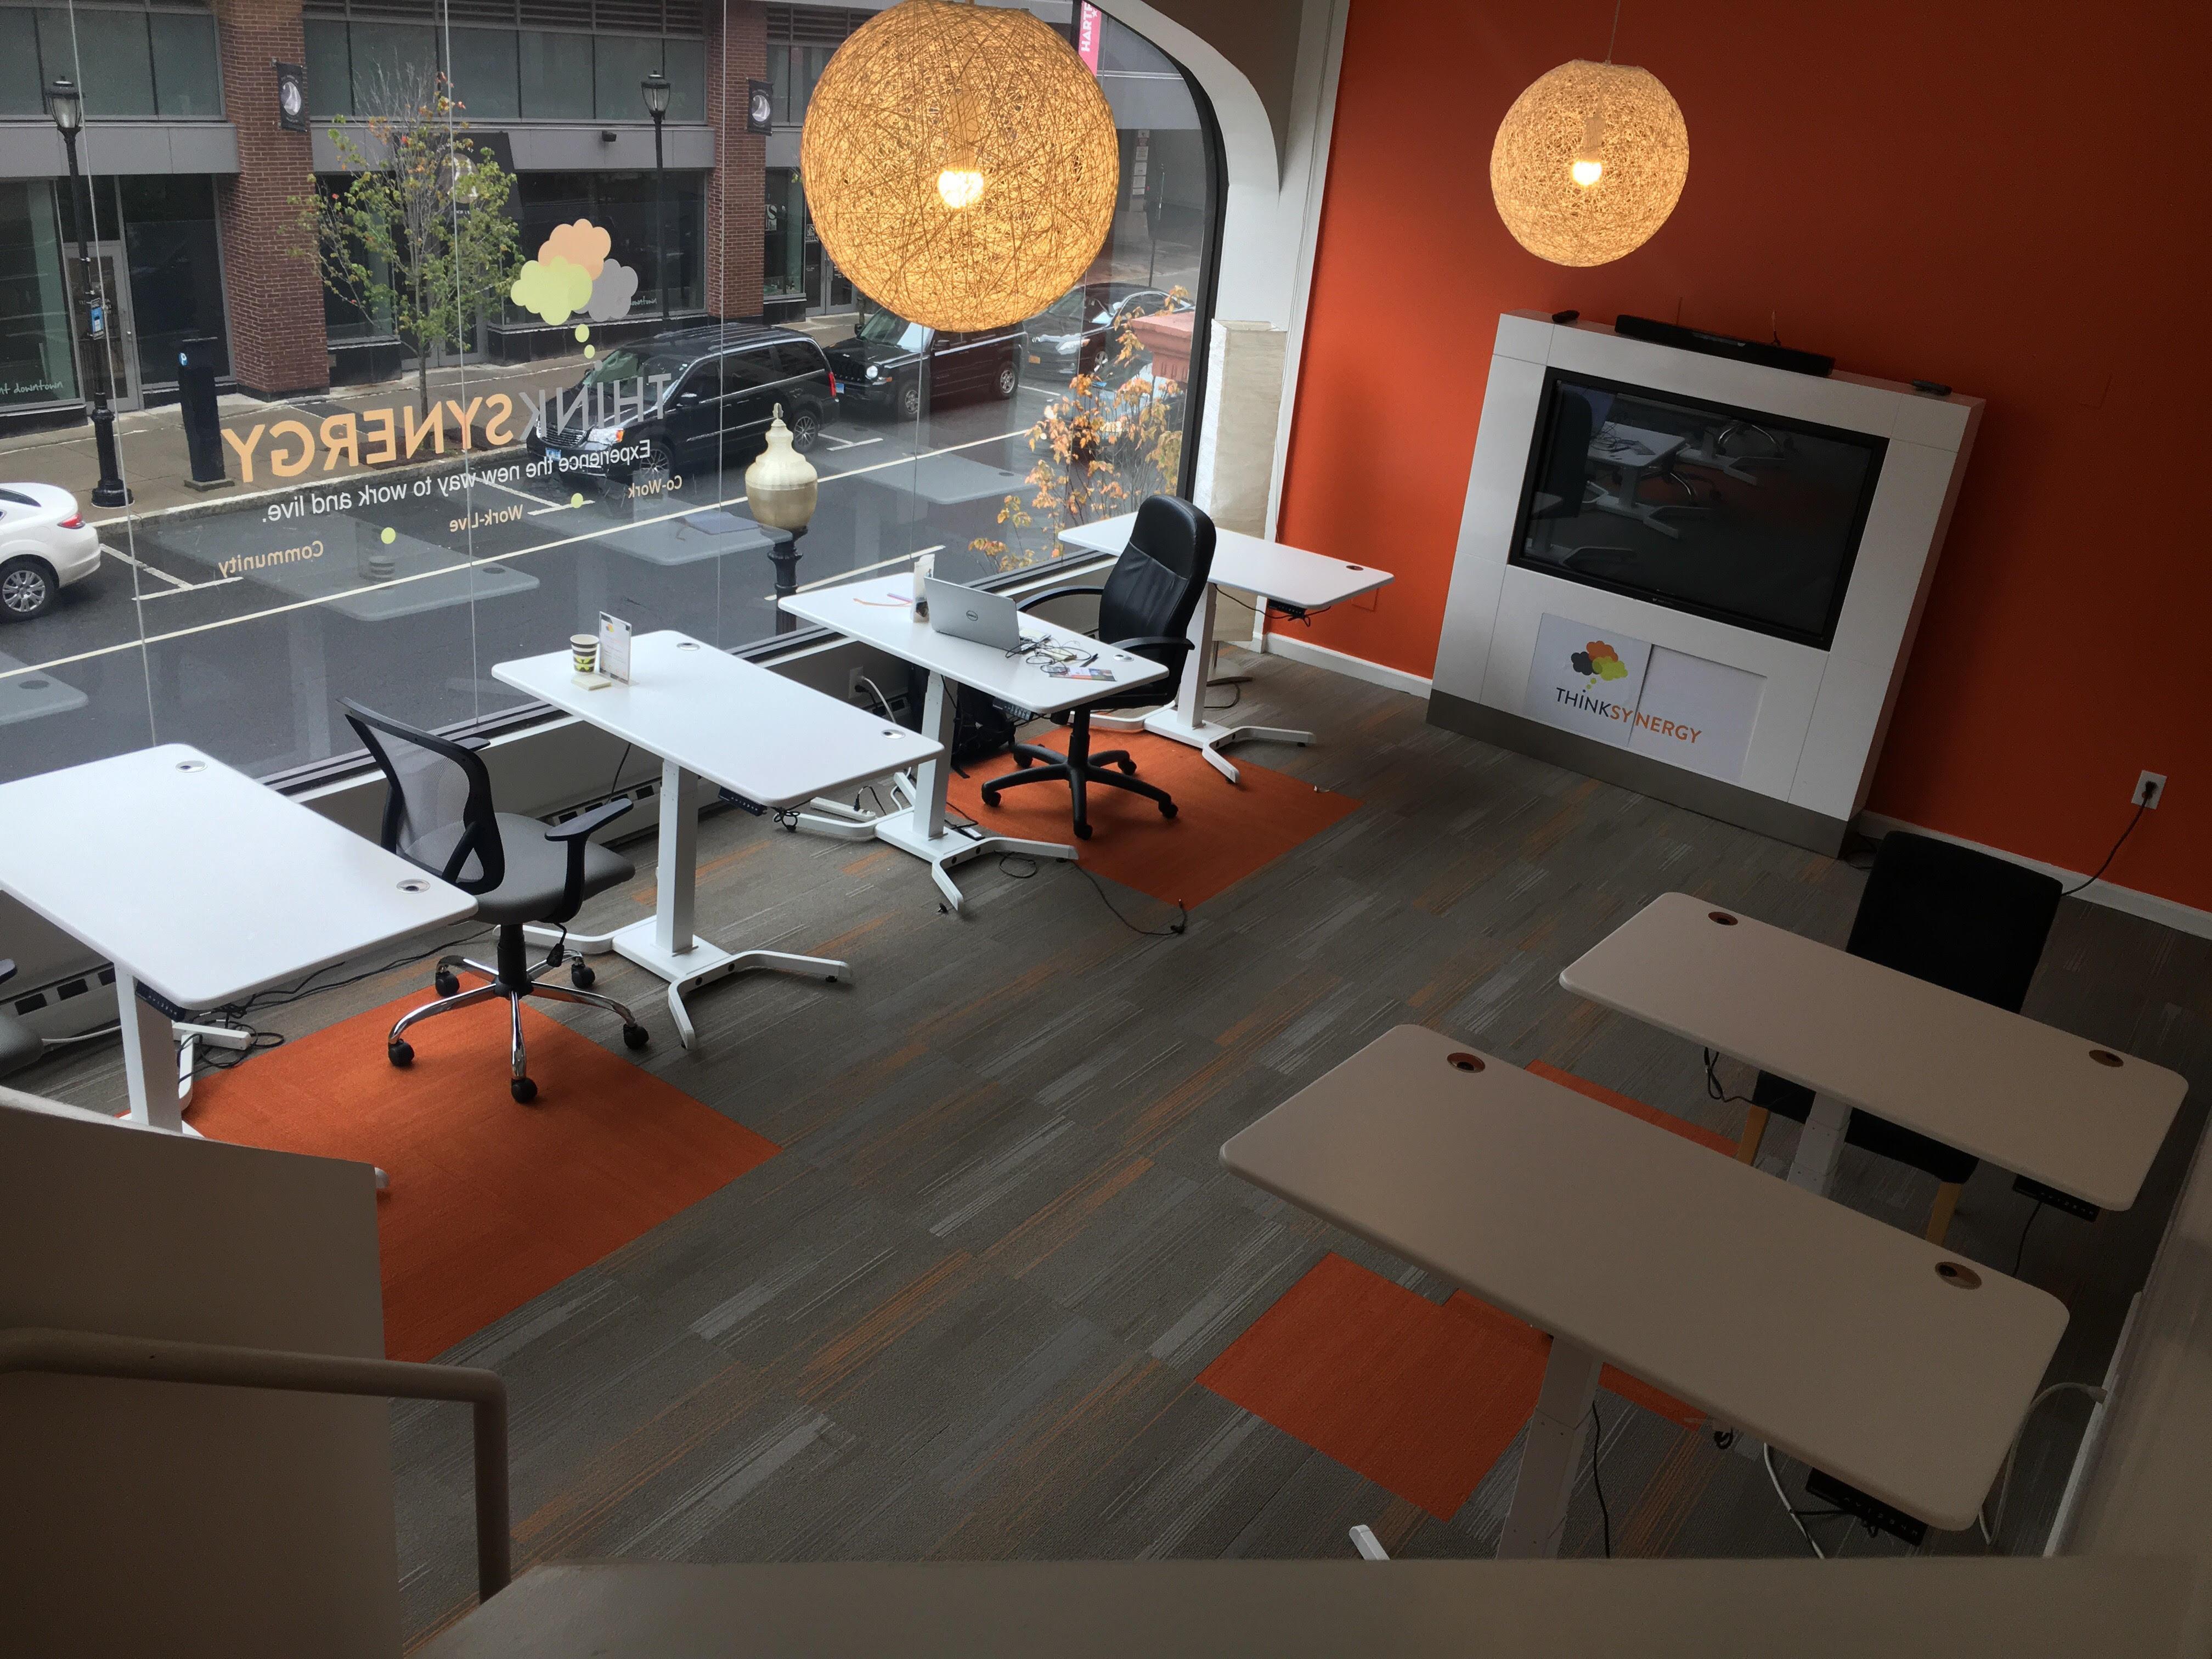 ThinkSynergy - Open Desk 1